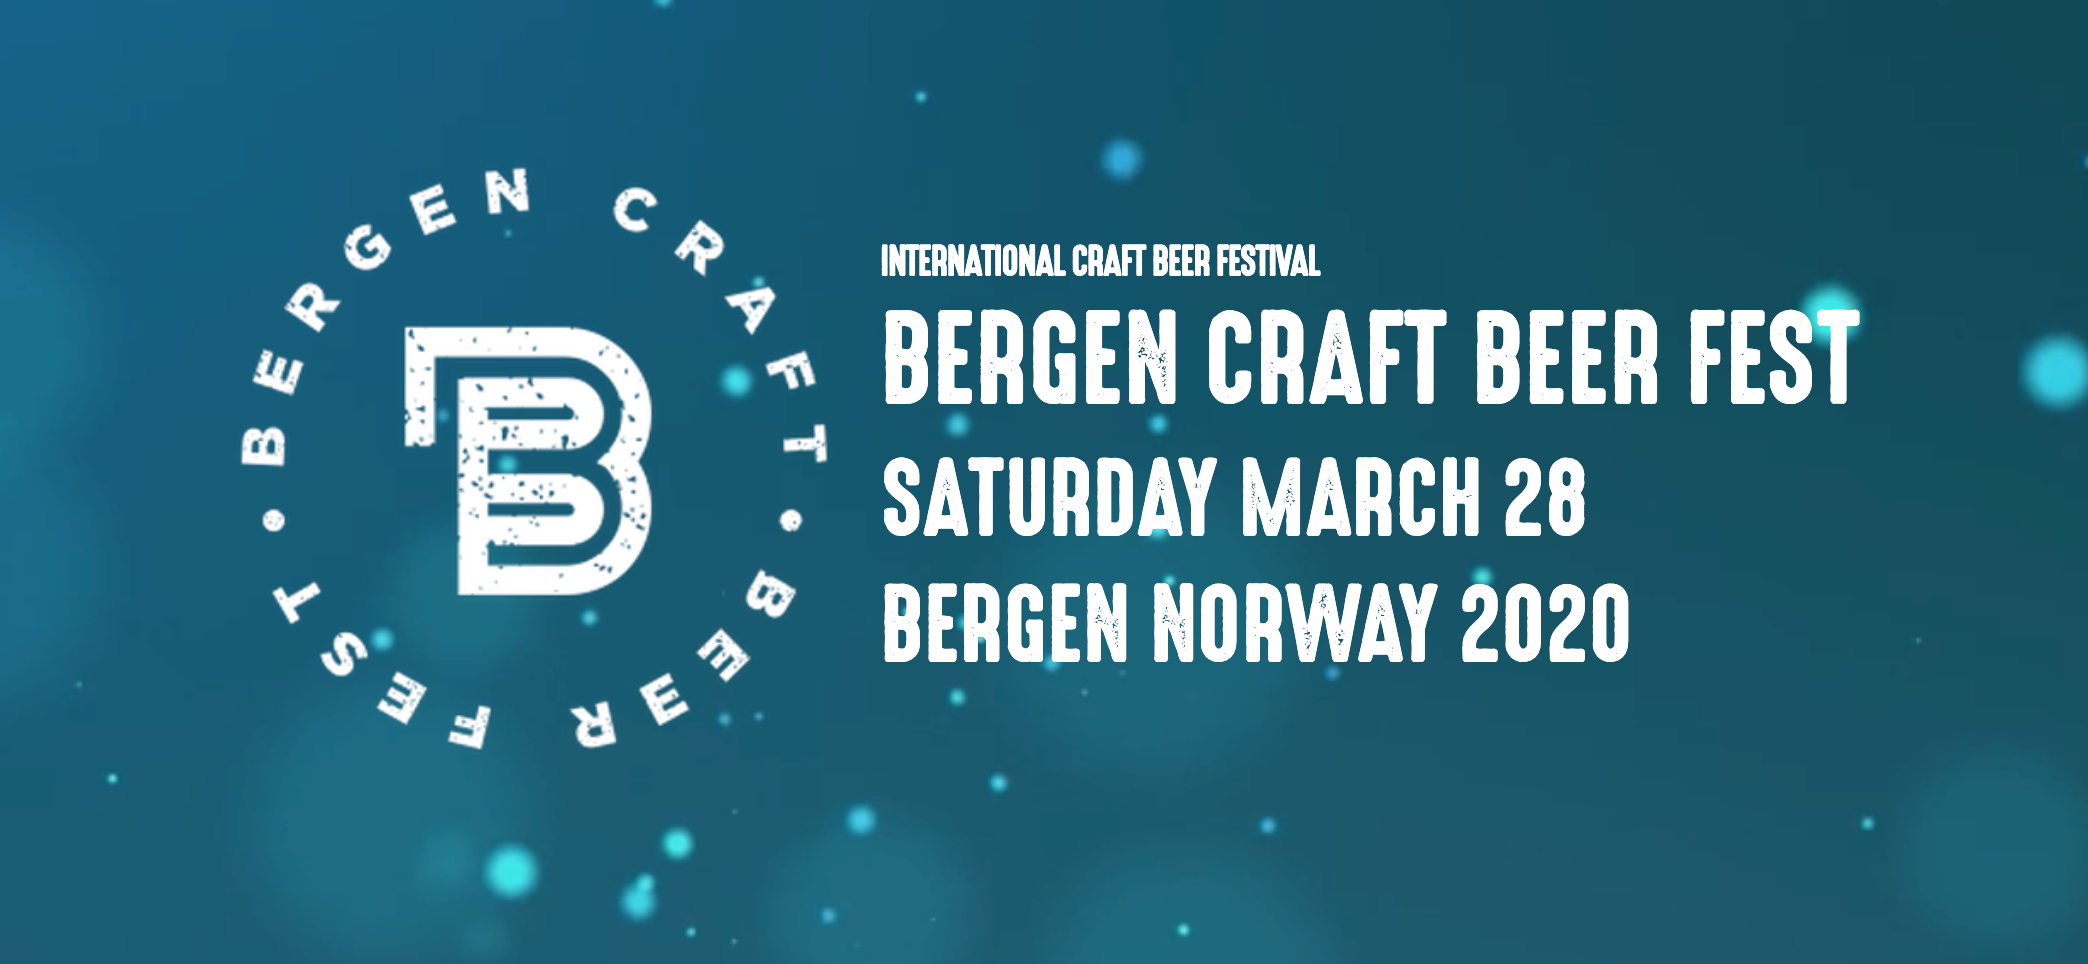 Craft Beer Festival 2020.Bergen Craft Beer Fest 2020